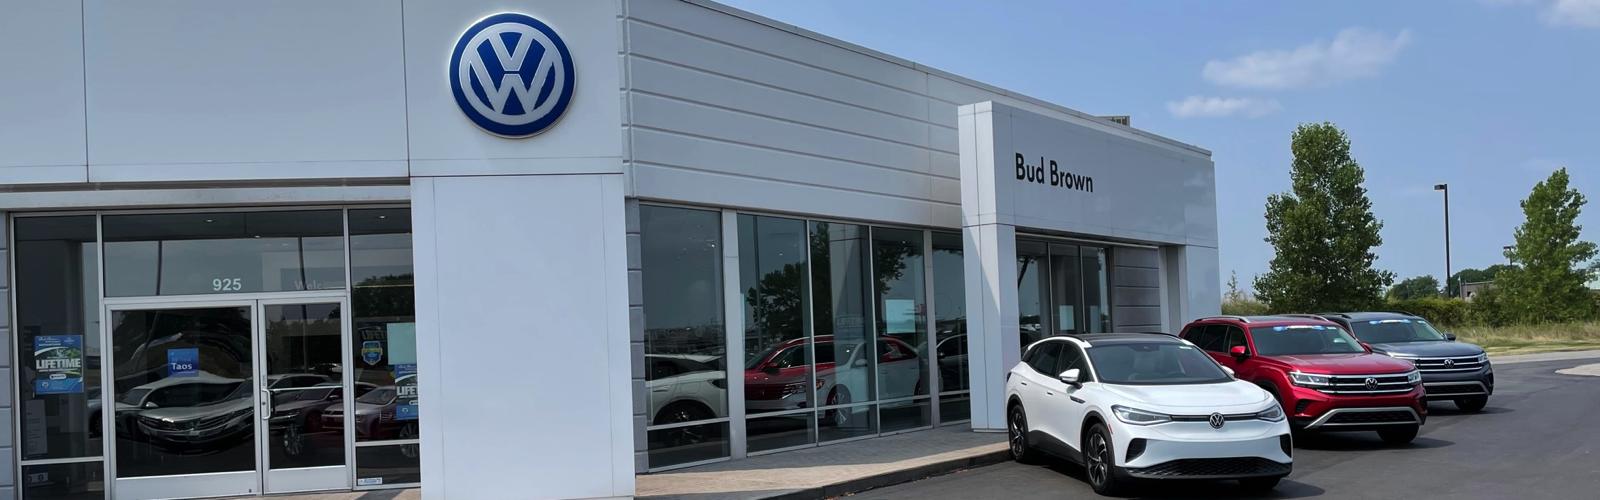 Bud Brown Volkswagen Olathe, Kansas